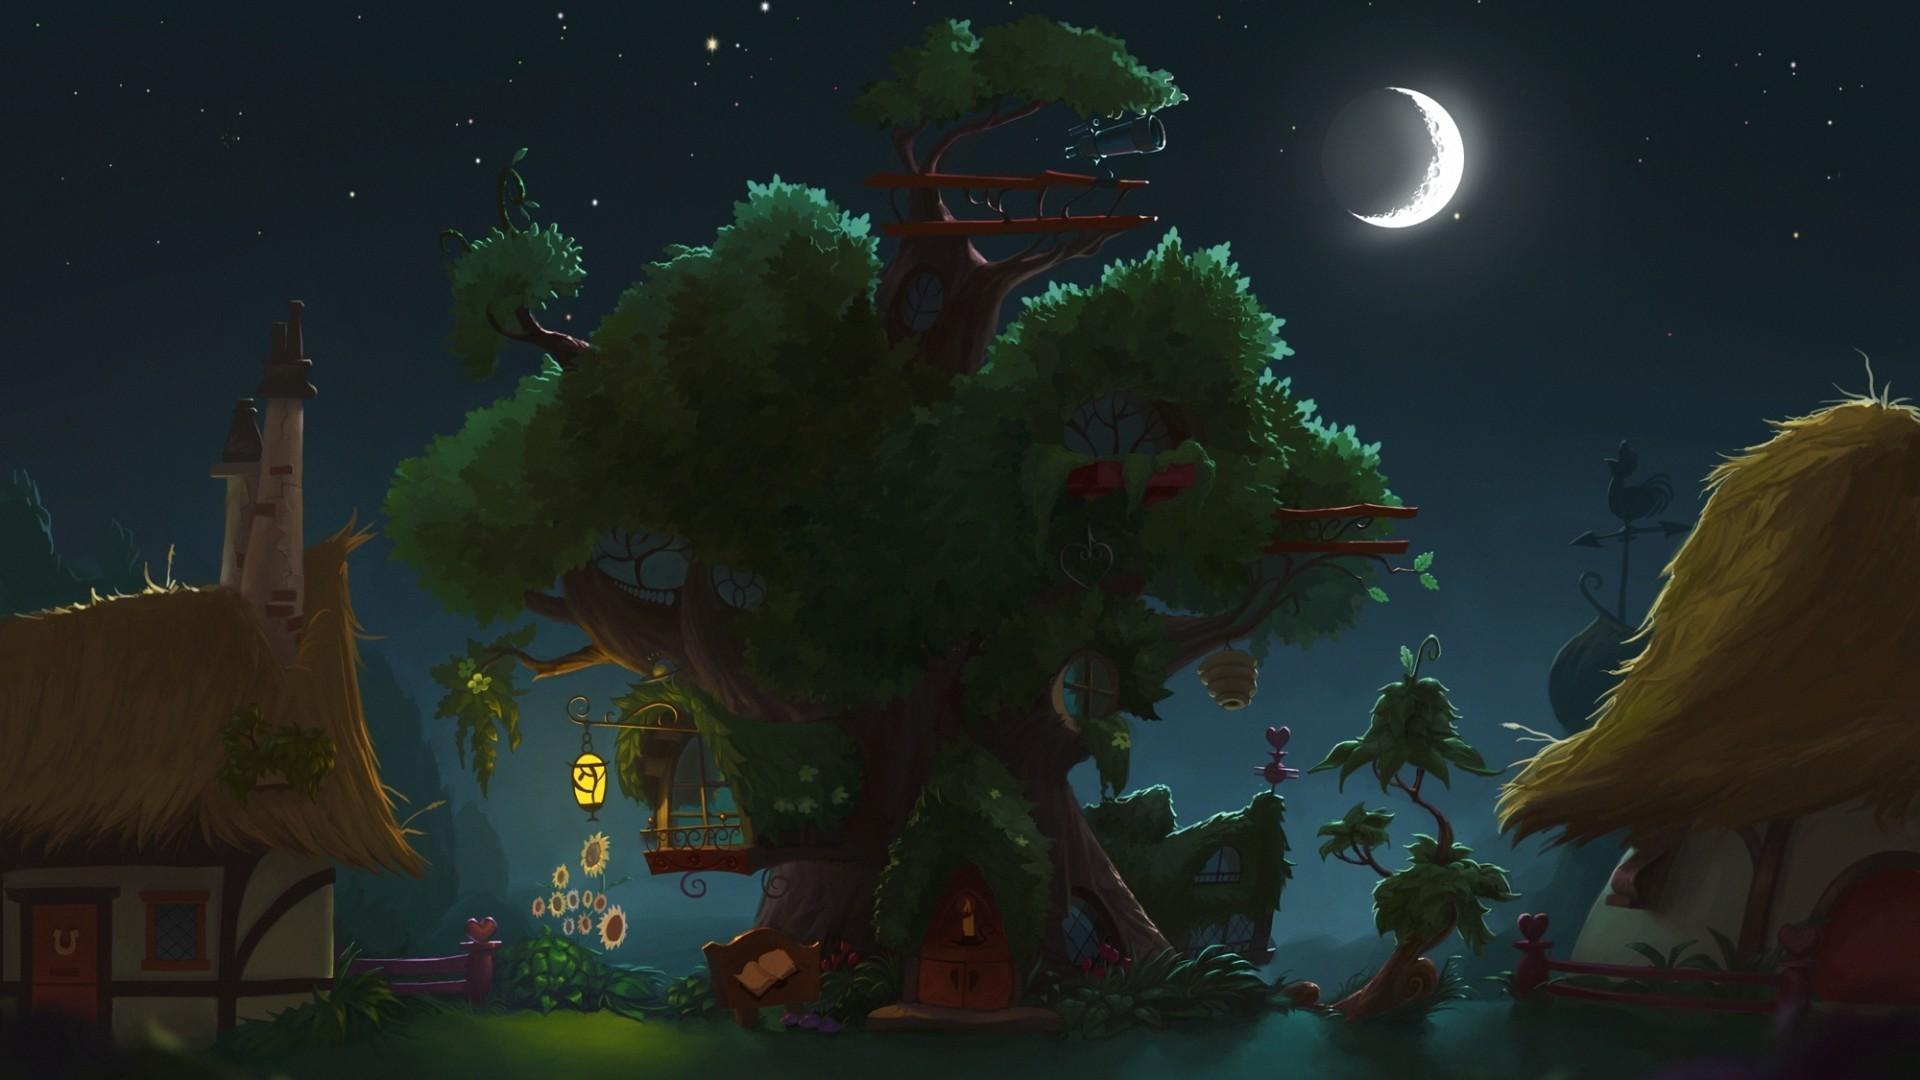 General 1920x1080 My Little Pony artwork house treehouses Moon night fantasy art Stealth_MLP